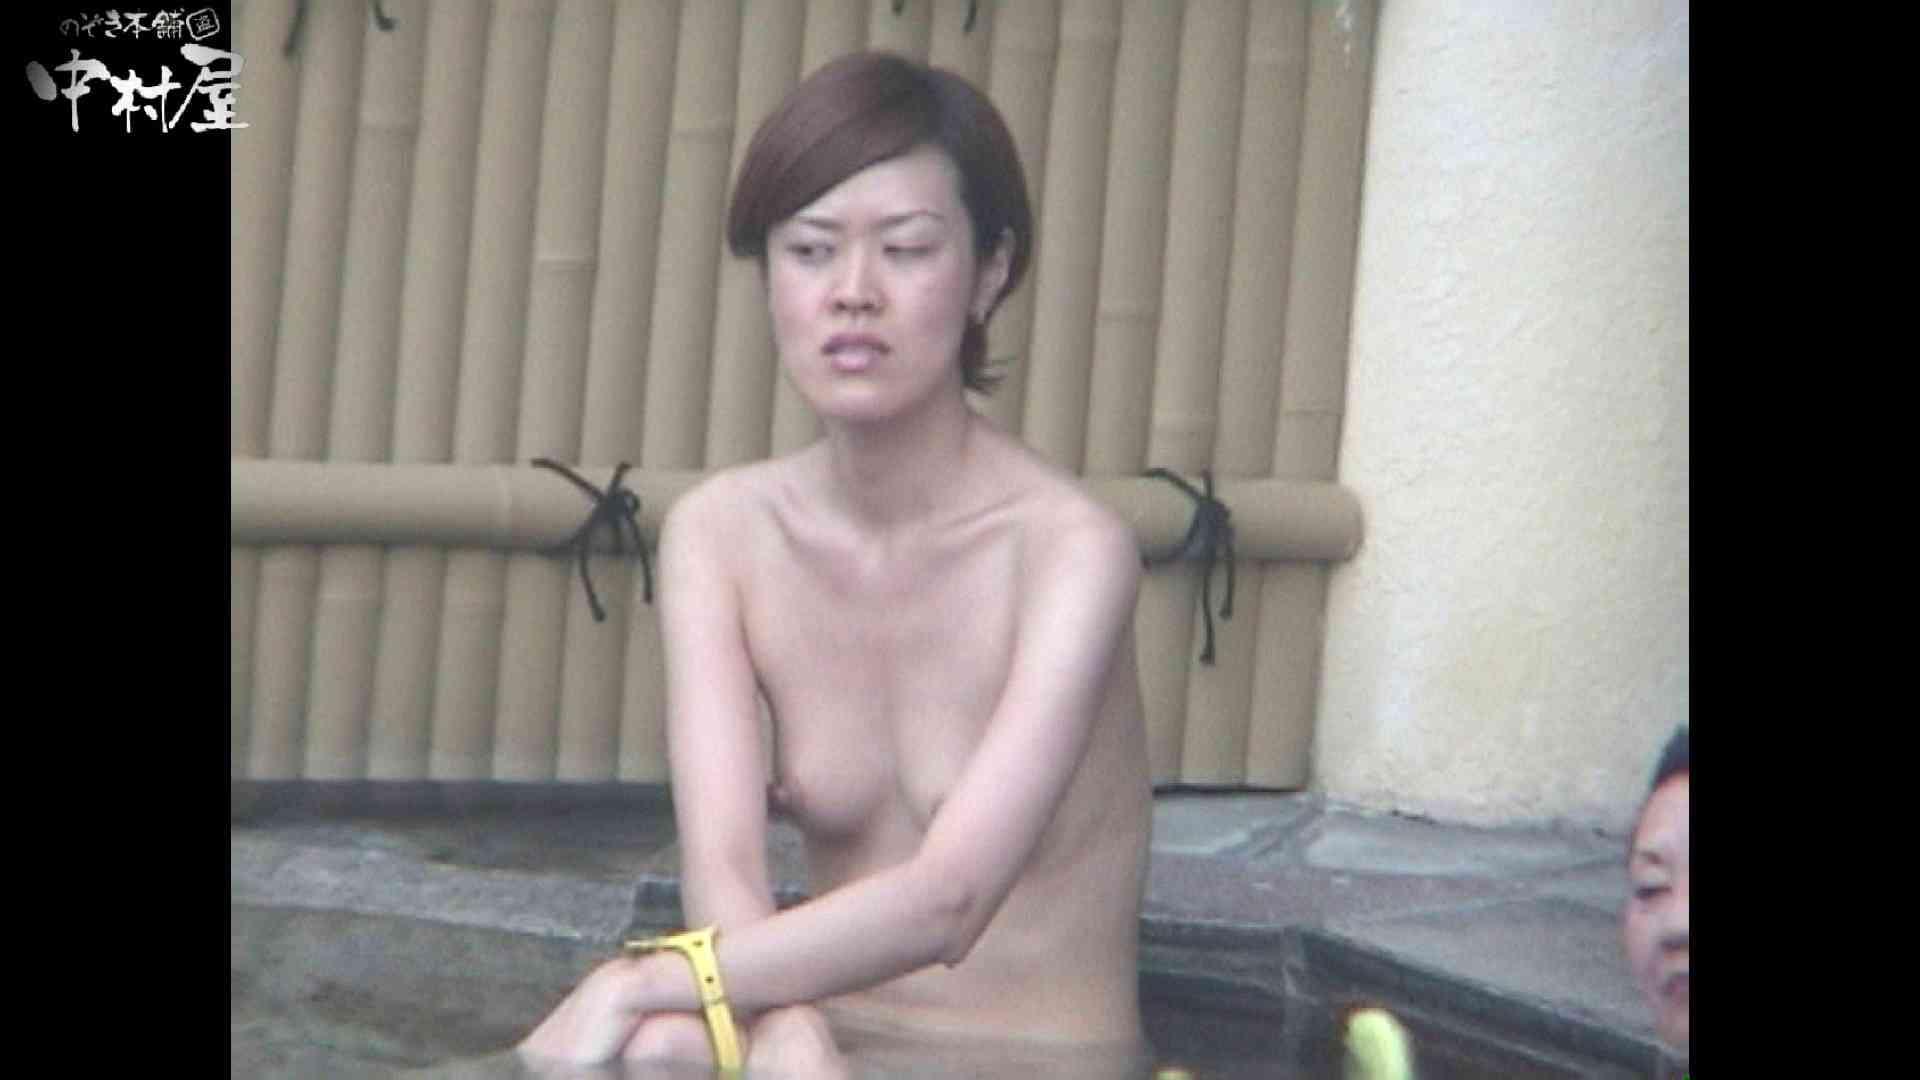 Aquaな露天風呂Vol.961 盗撮 のぞき動画画像 61枚 41